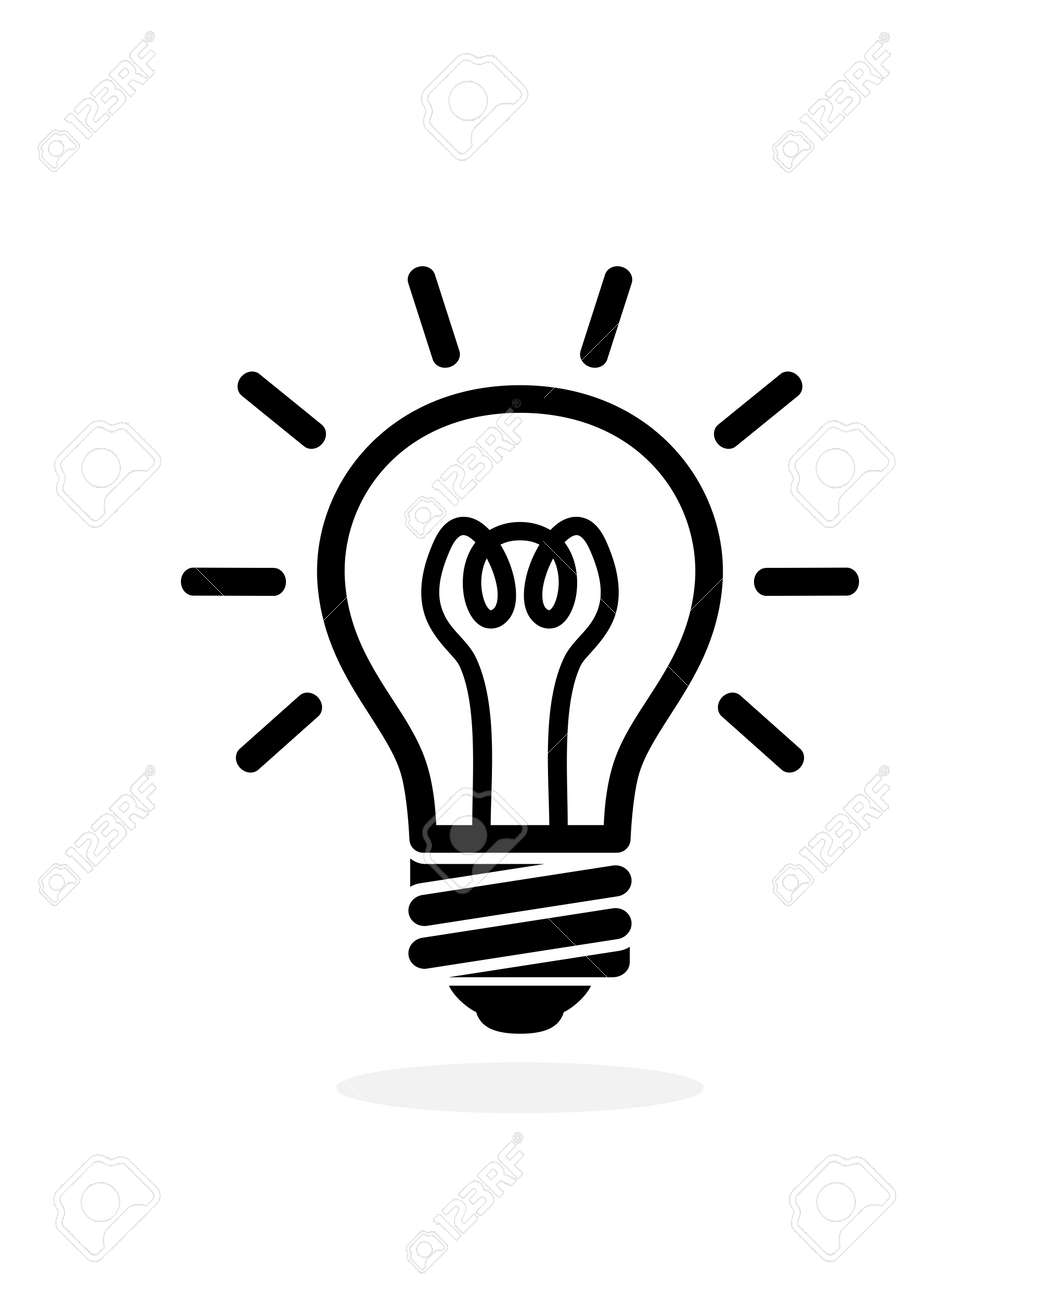 light bulb outline icon. Vector logo bulb isolated on white background - 169568148